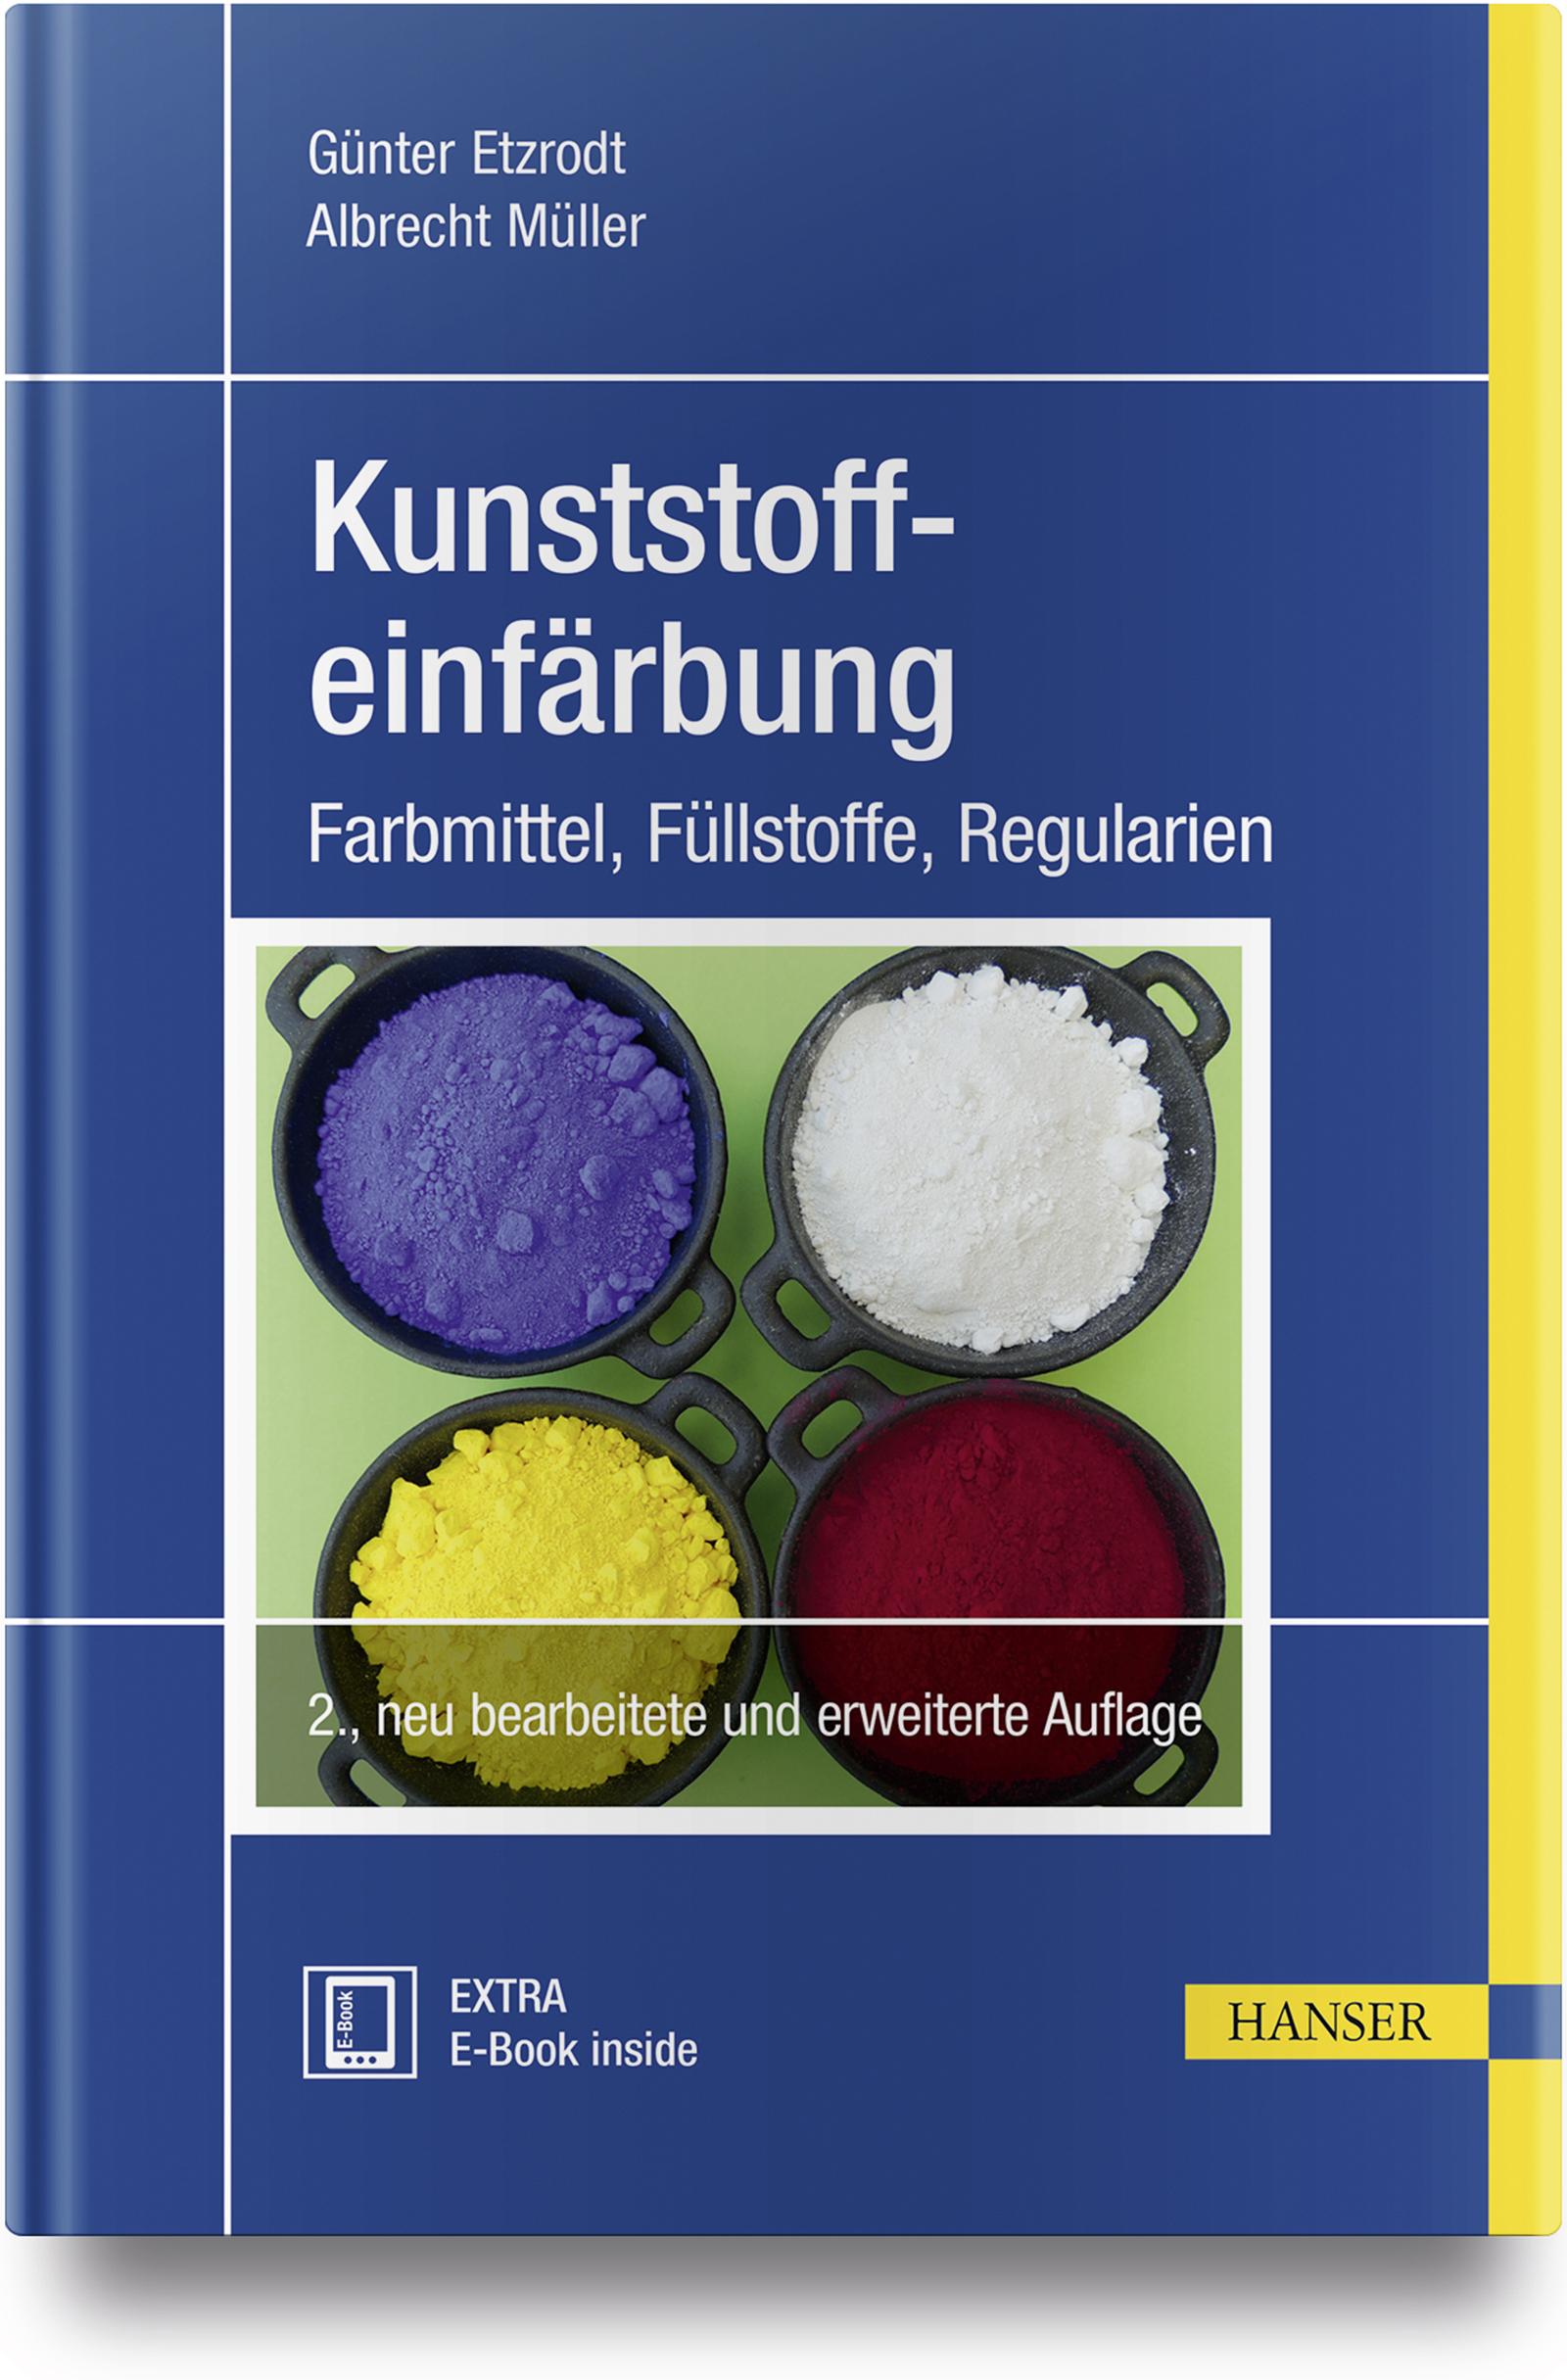 Etzrodt, Müller, Kunststoffeinfärbung, 978-3-446-45462-0